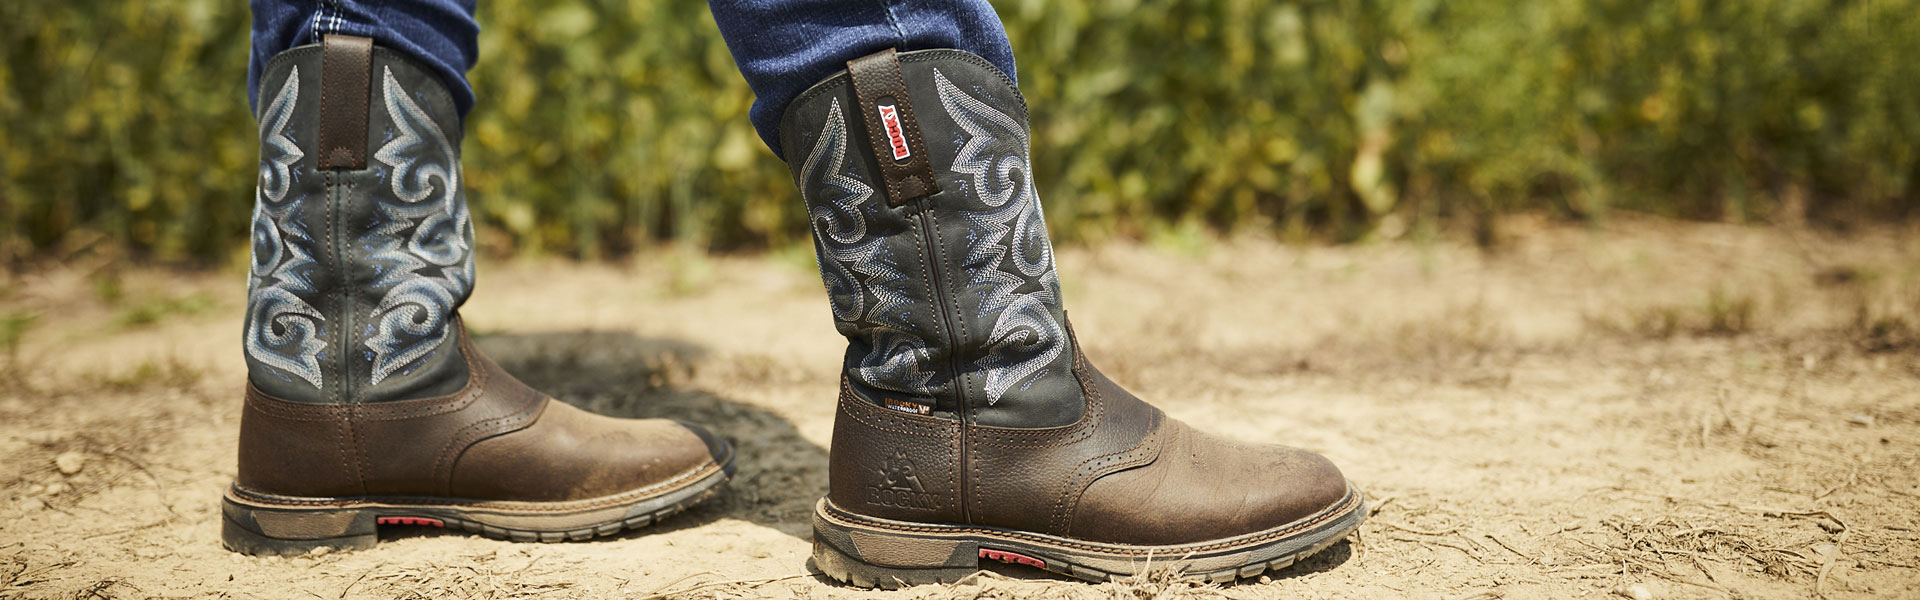 rocky womens western boots